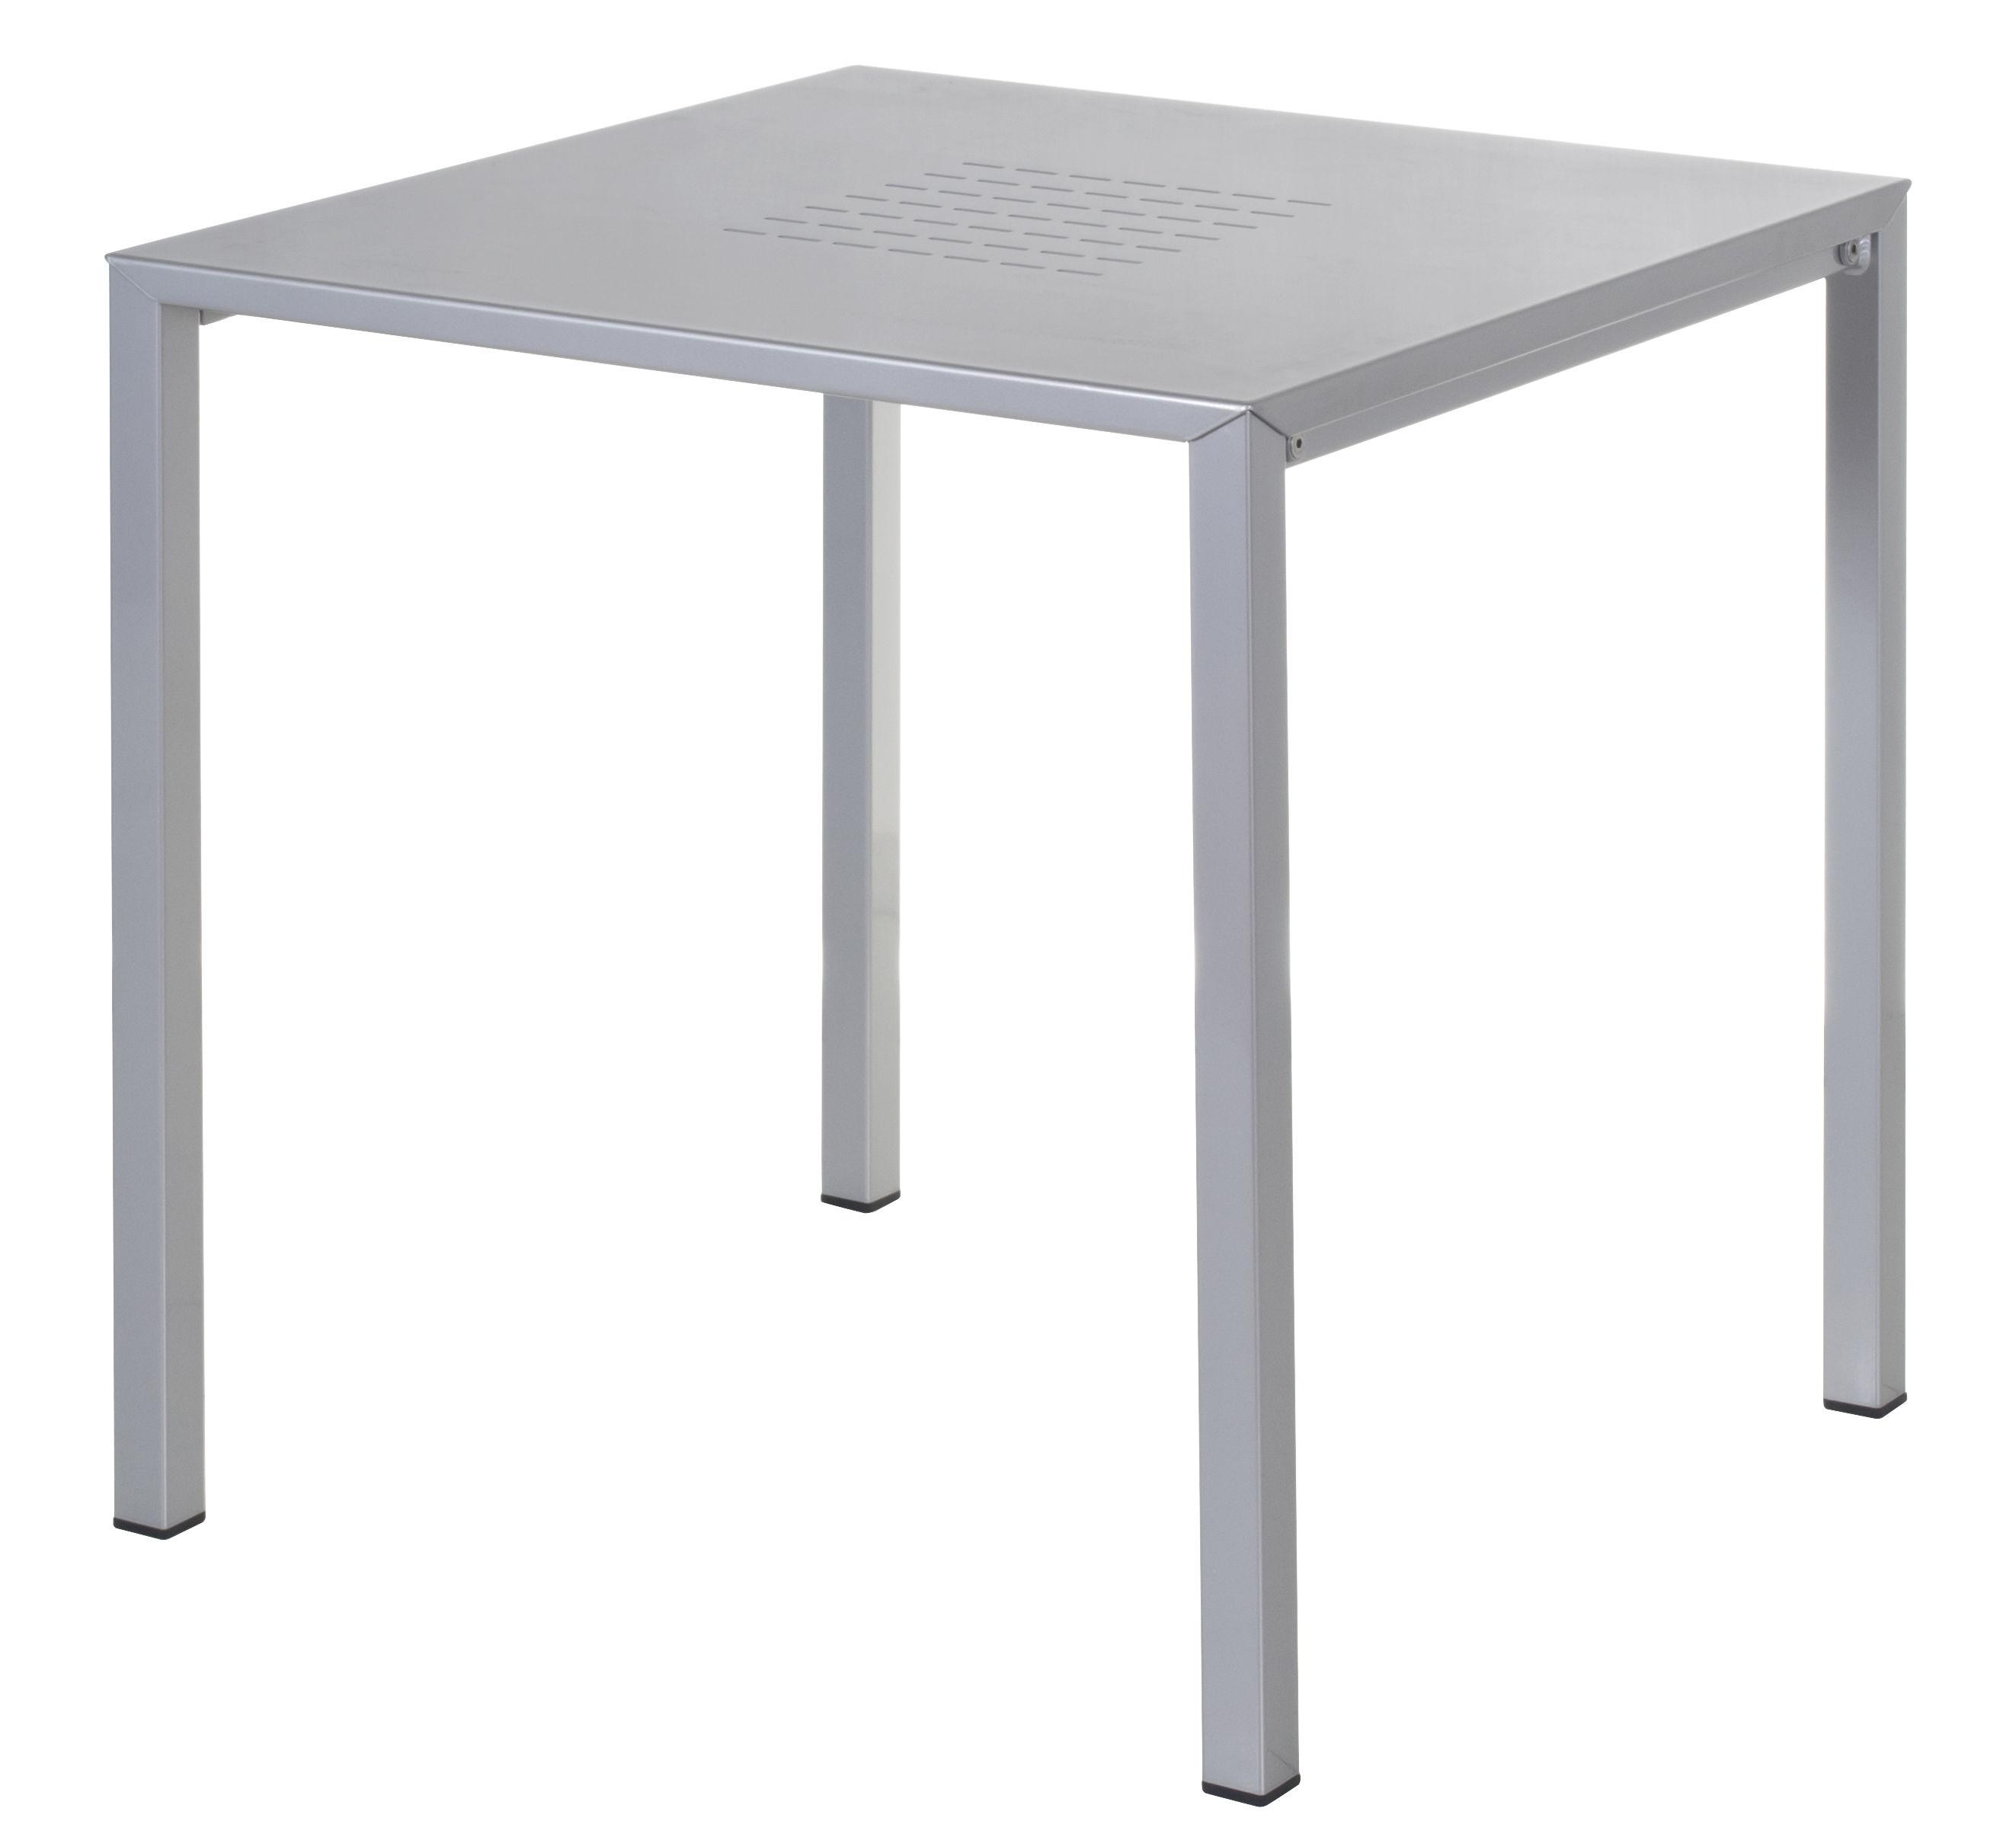 Table urban 80 x 80 cm aluminium aluminium emu for Table 80 x 80